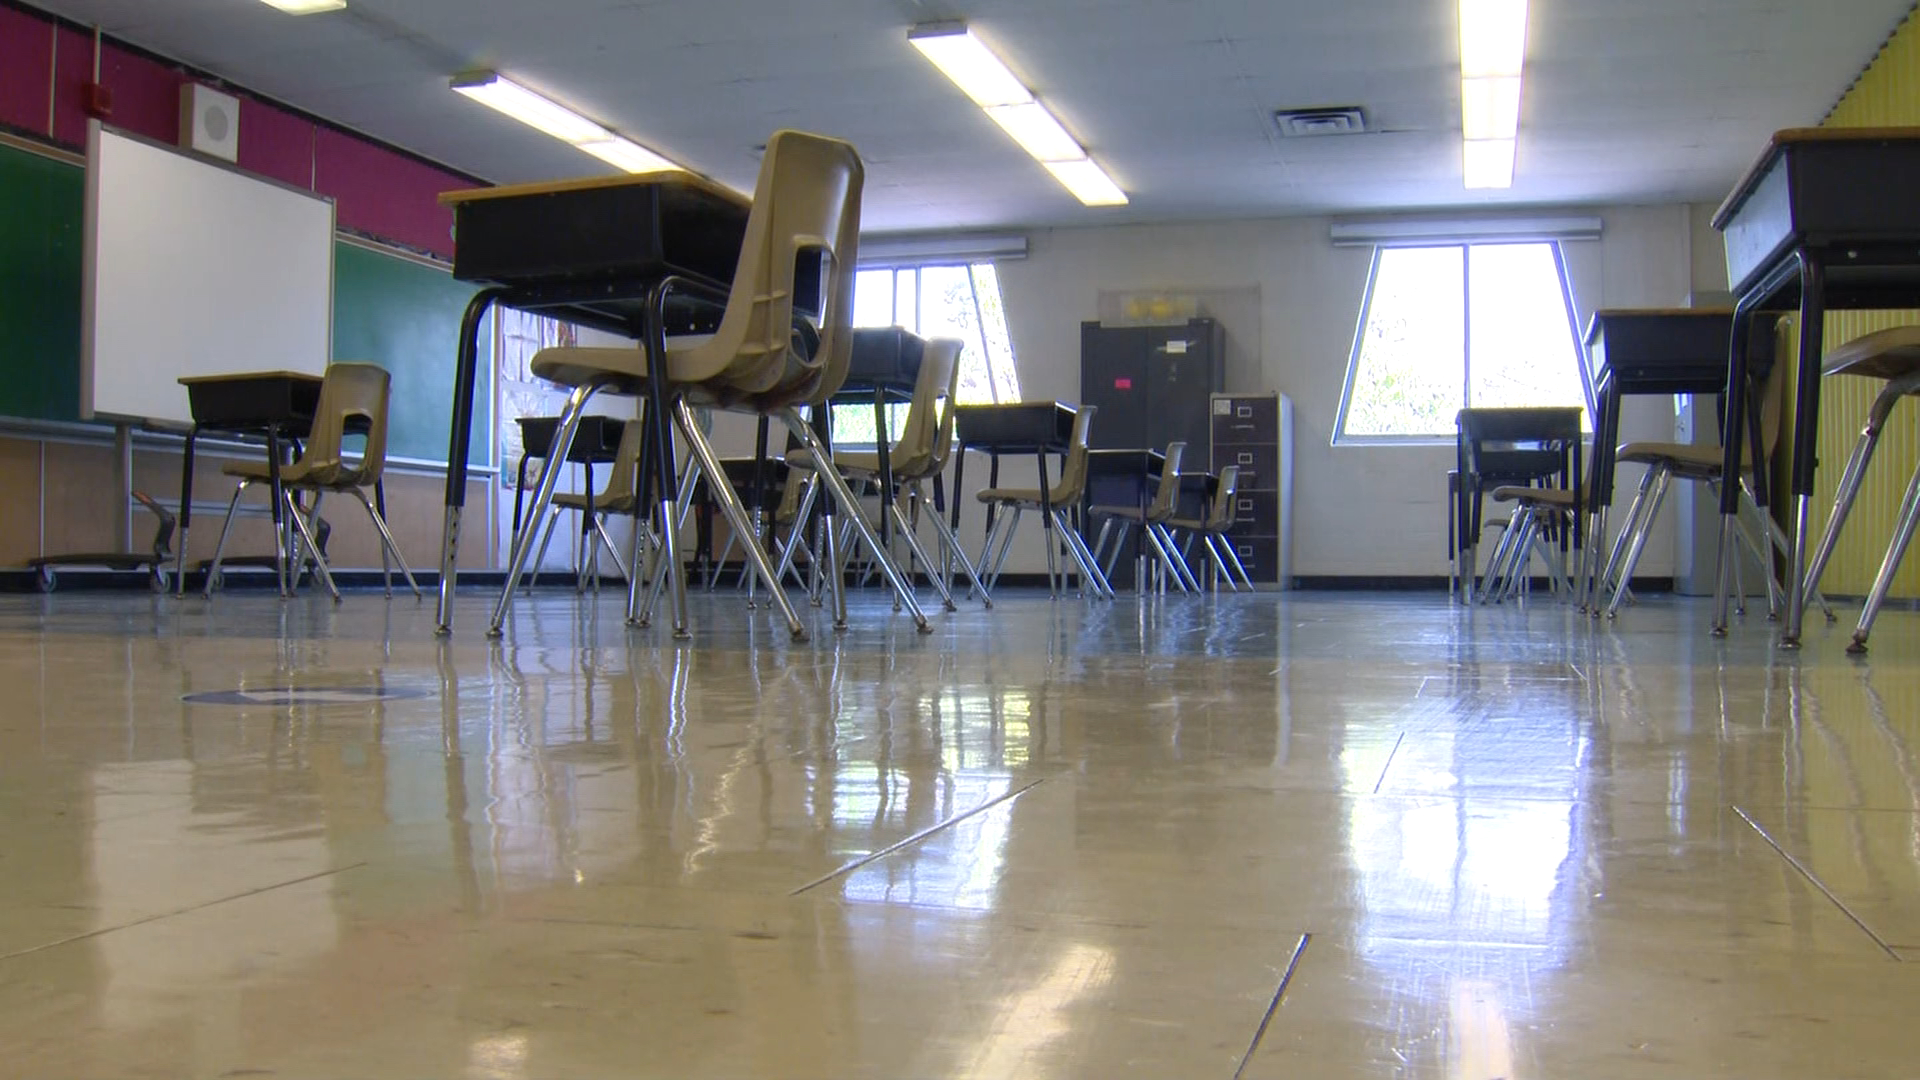 An empty classroom inside Toronto's Kensington Community School